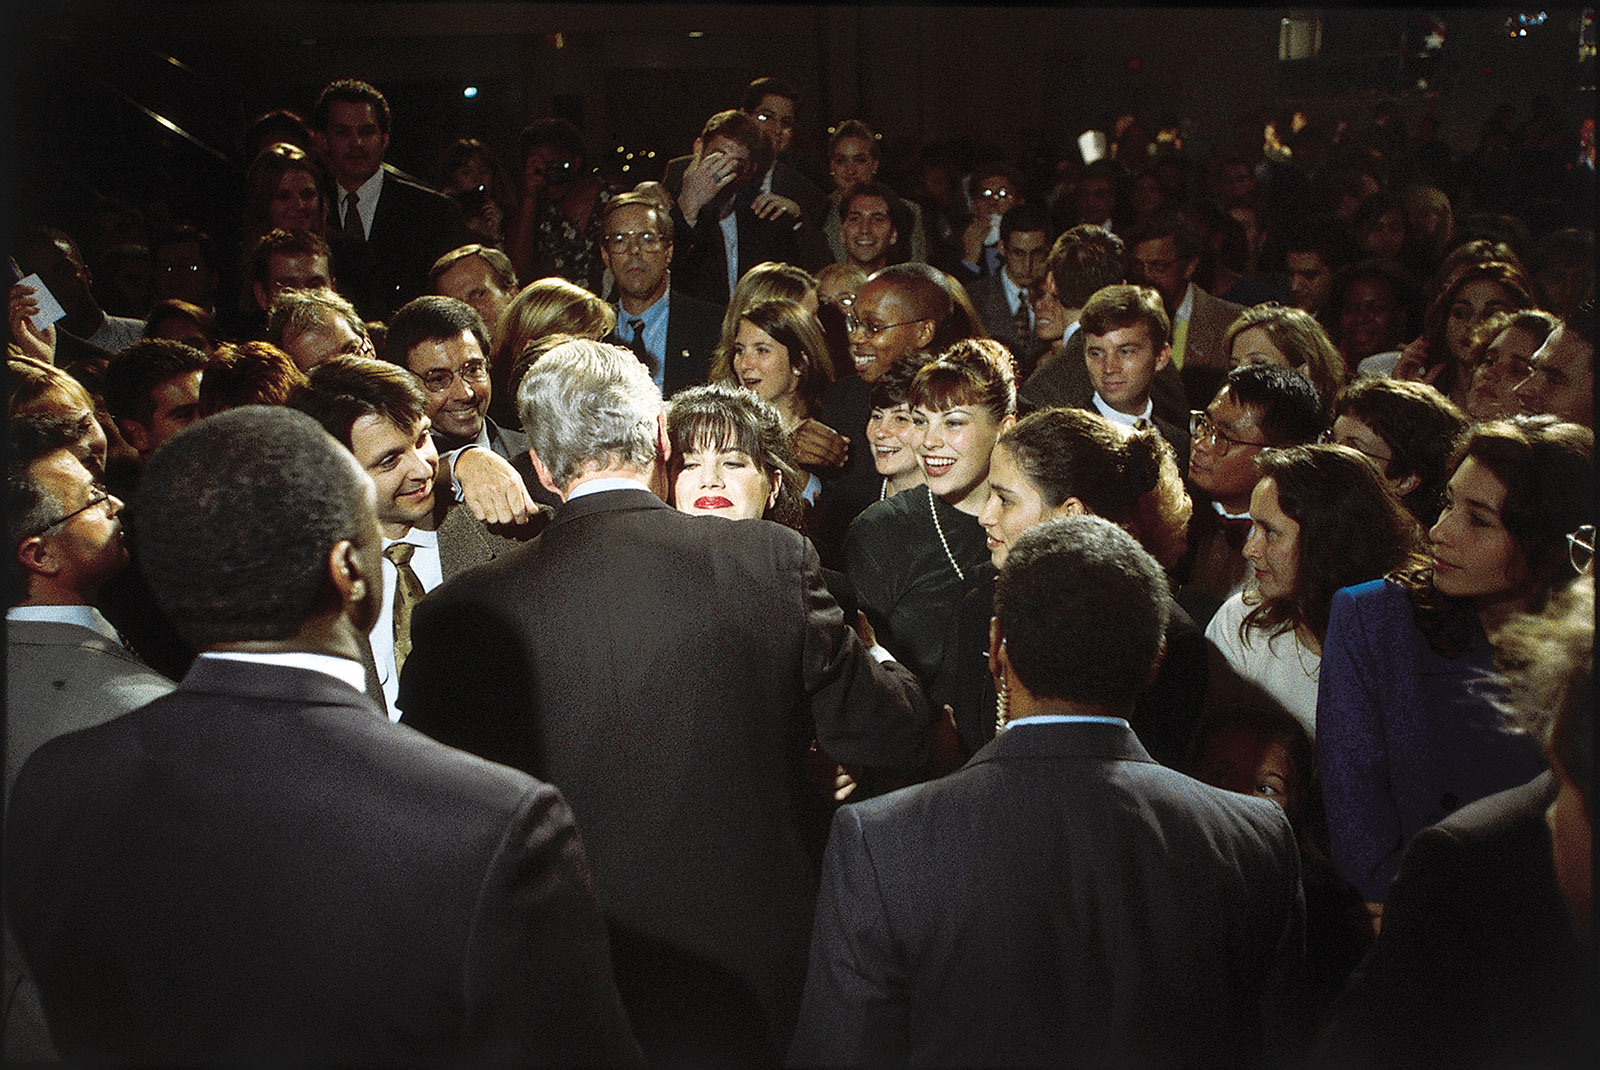 President Bill Clinton with Monica Lewinsky at a fund-raiser, Washington, D.C., October 1996